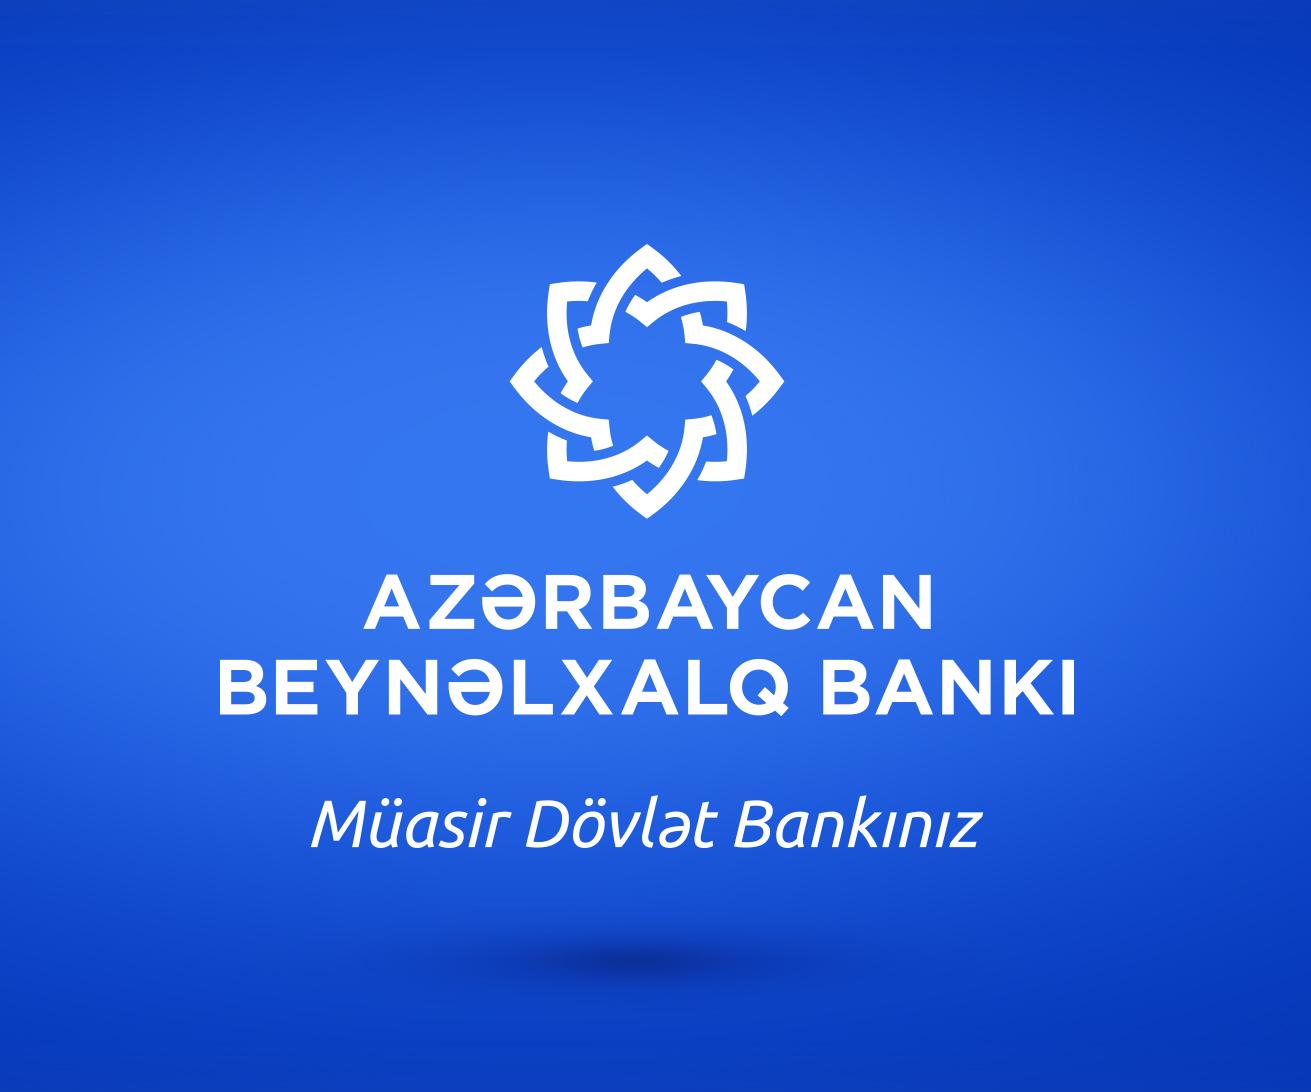 Международный Банк Азербайджана увеличил свой капитал